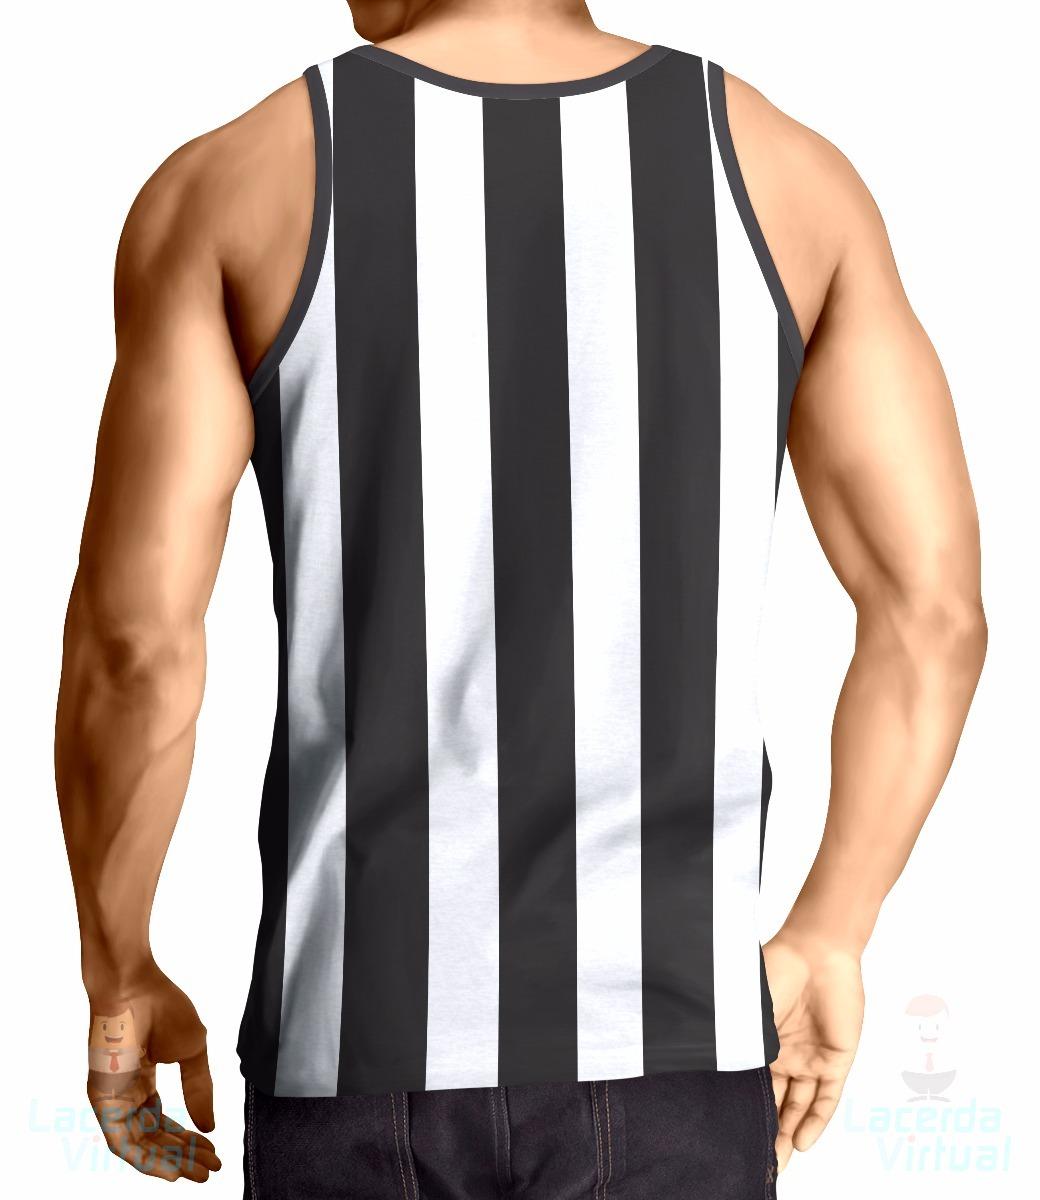 8c2d92e327a90 camiseta regata botafogo 2017 - estampa total. Carregando zoom.